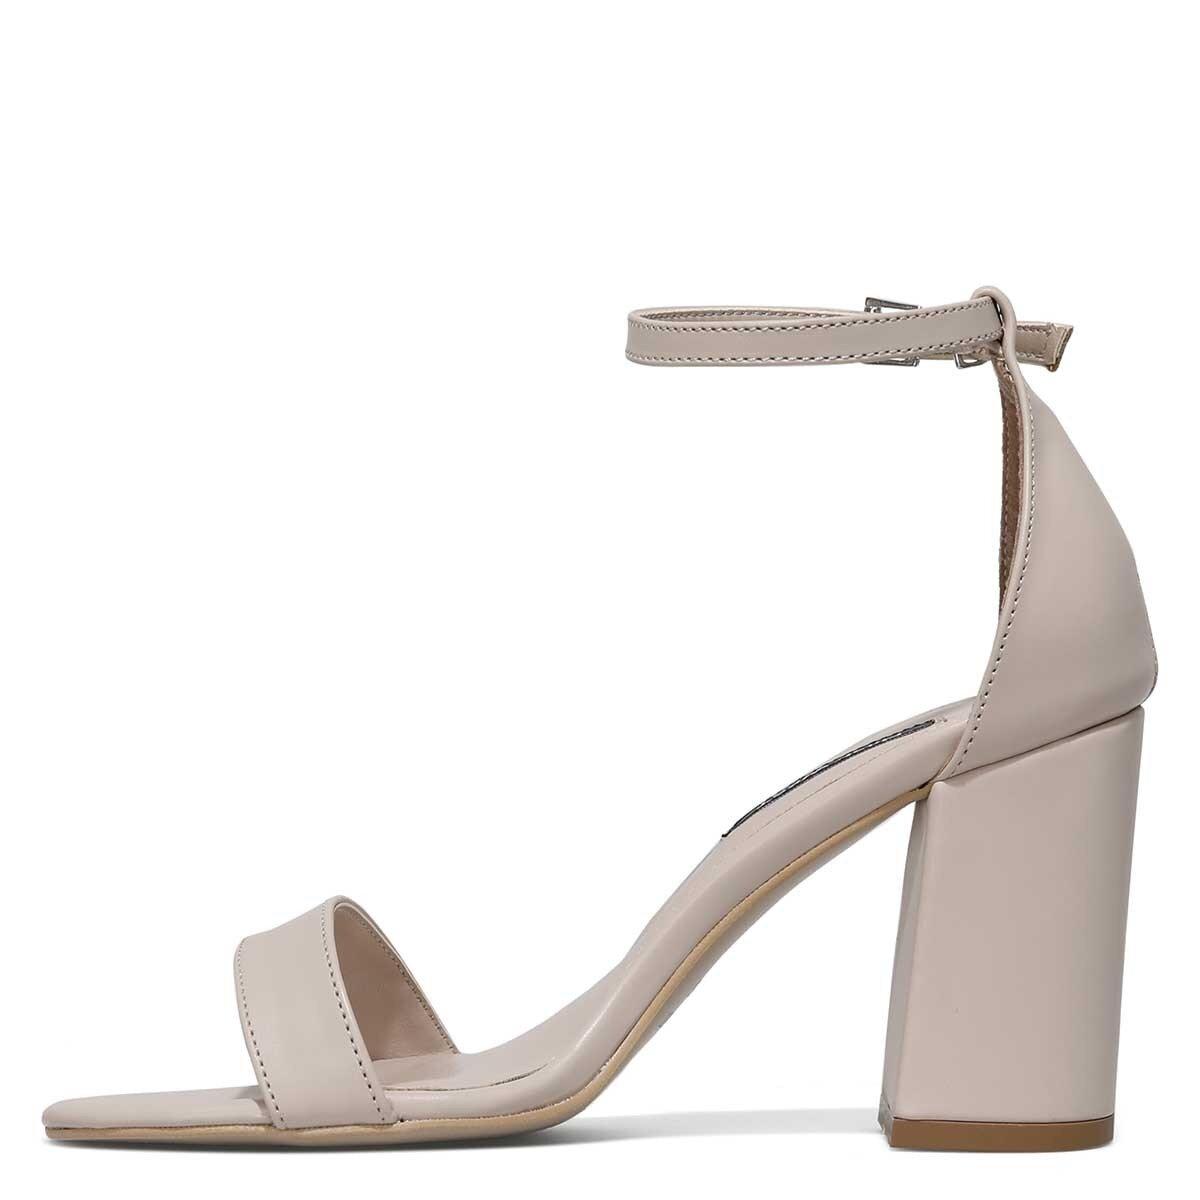 MAYSIE 1FX Naturel Kadın Topuklu Sandalet